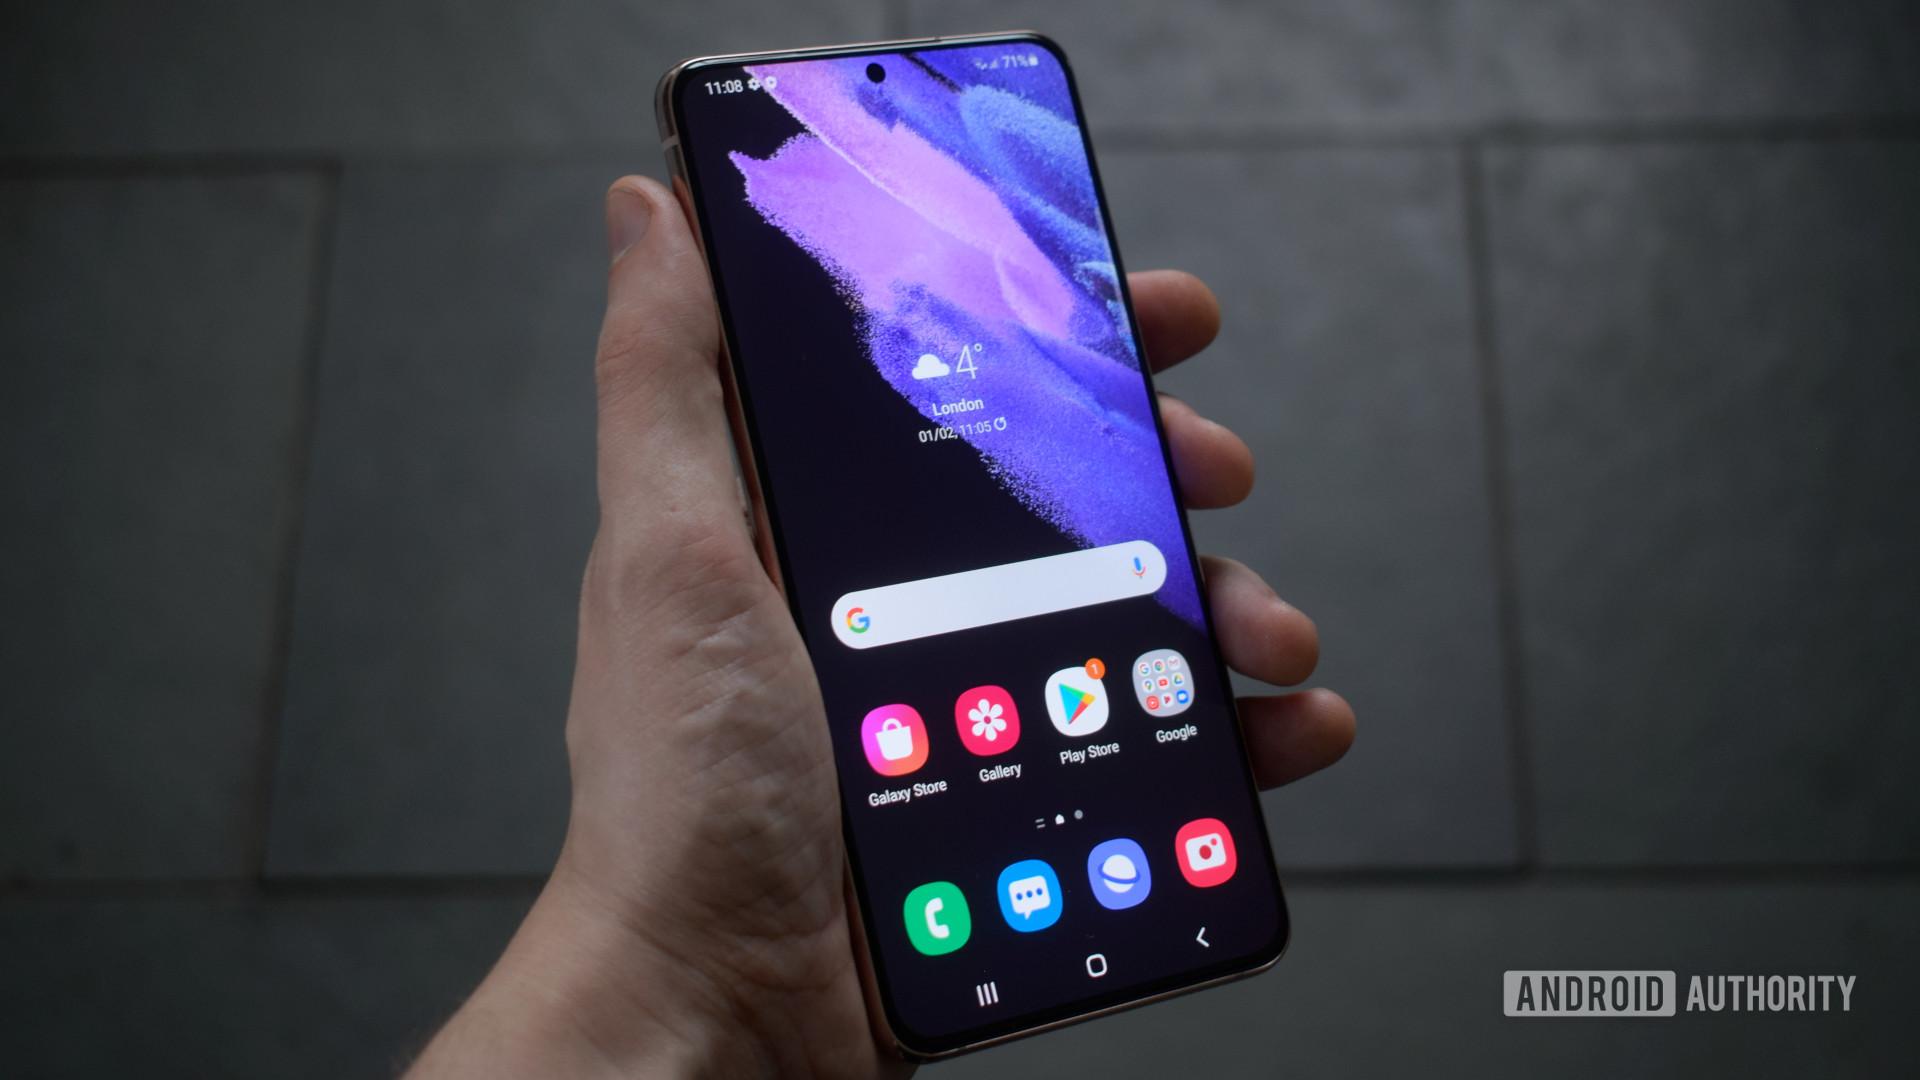 Samsung Galaxy S21 Plus front